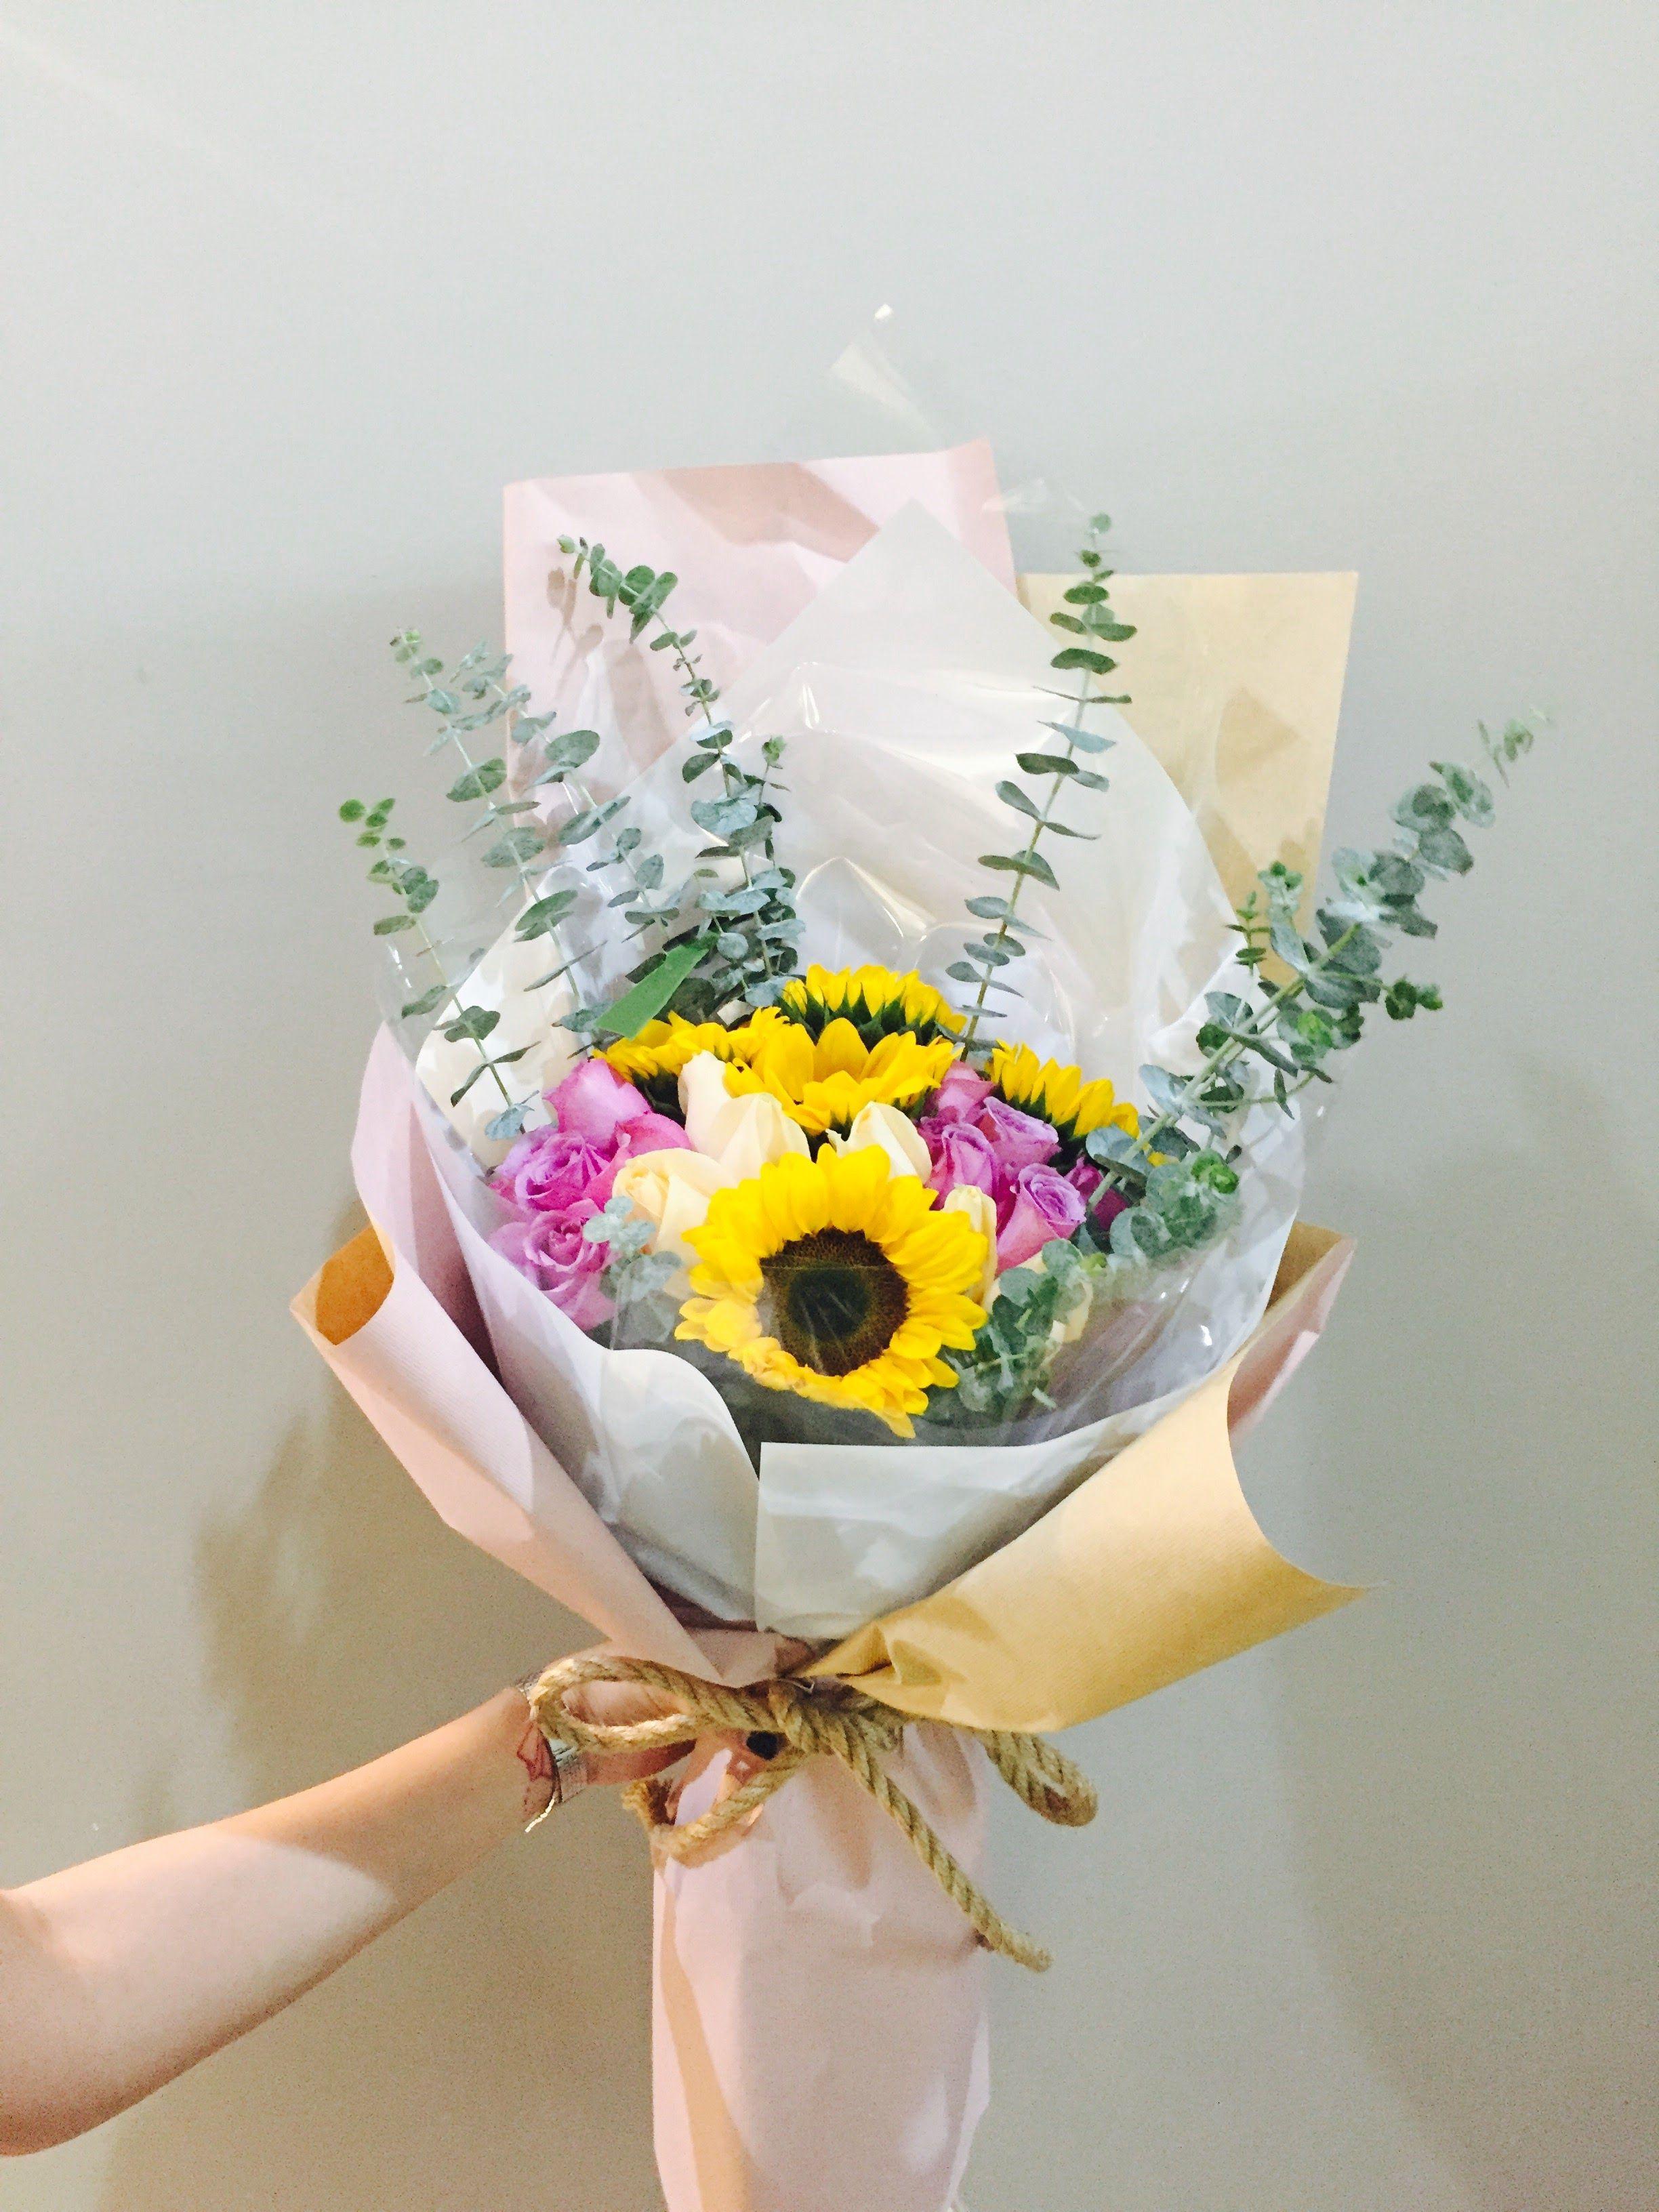 Florist flower bouquet mini bouquet flower designs florist flower bouquet mini bouquet flower designs sunflowers izmirmasajfo